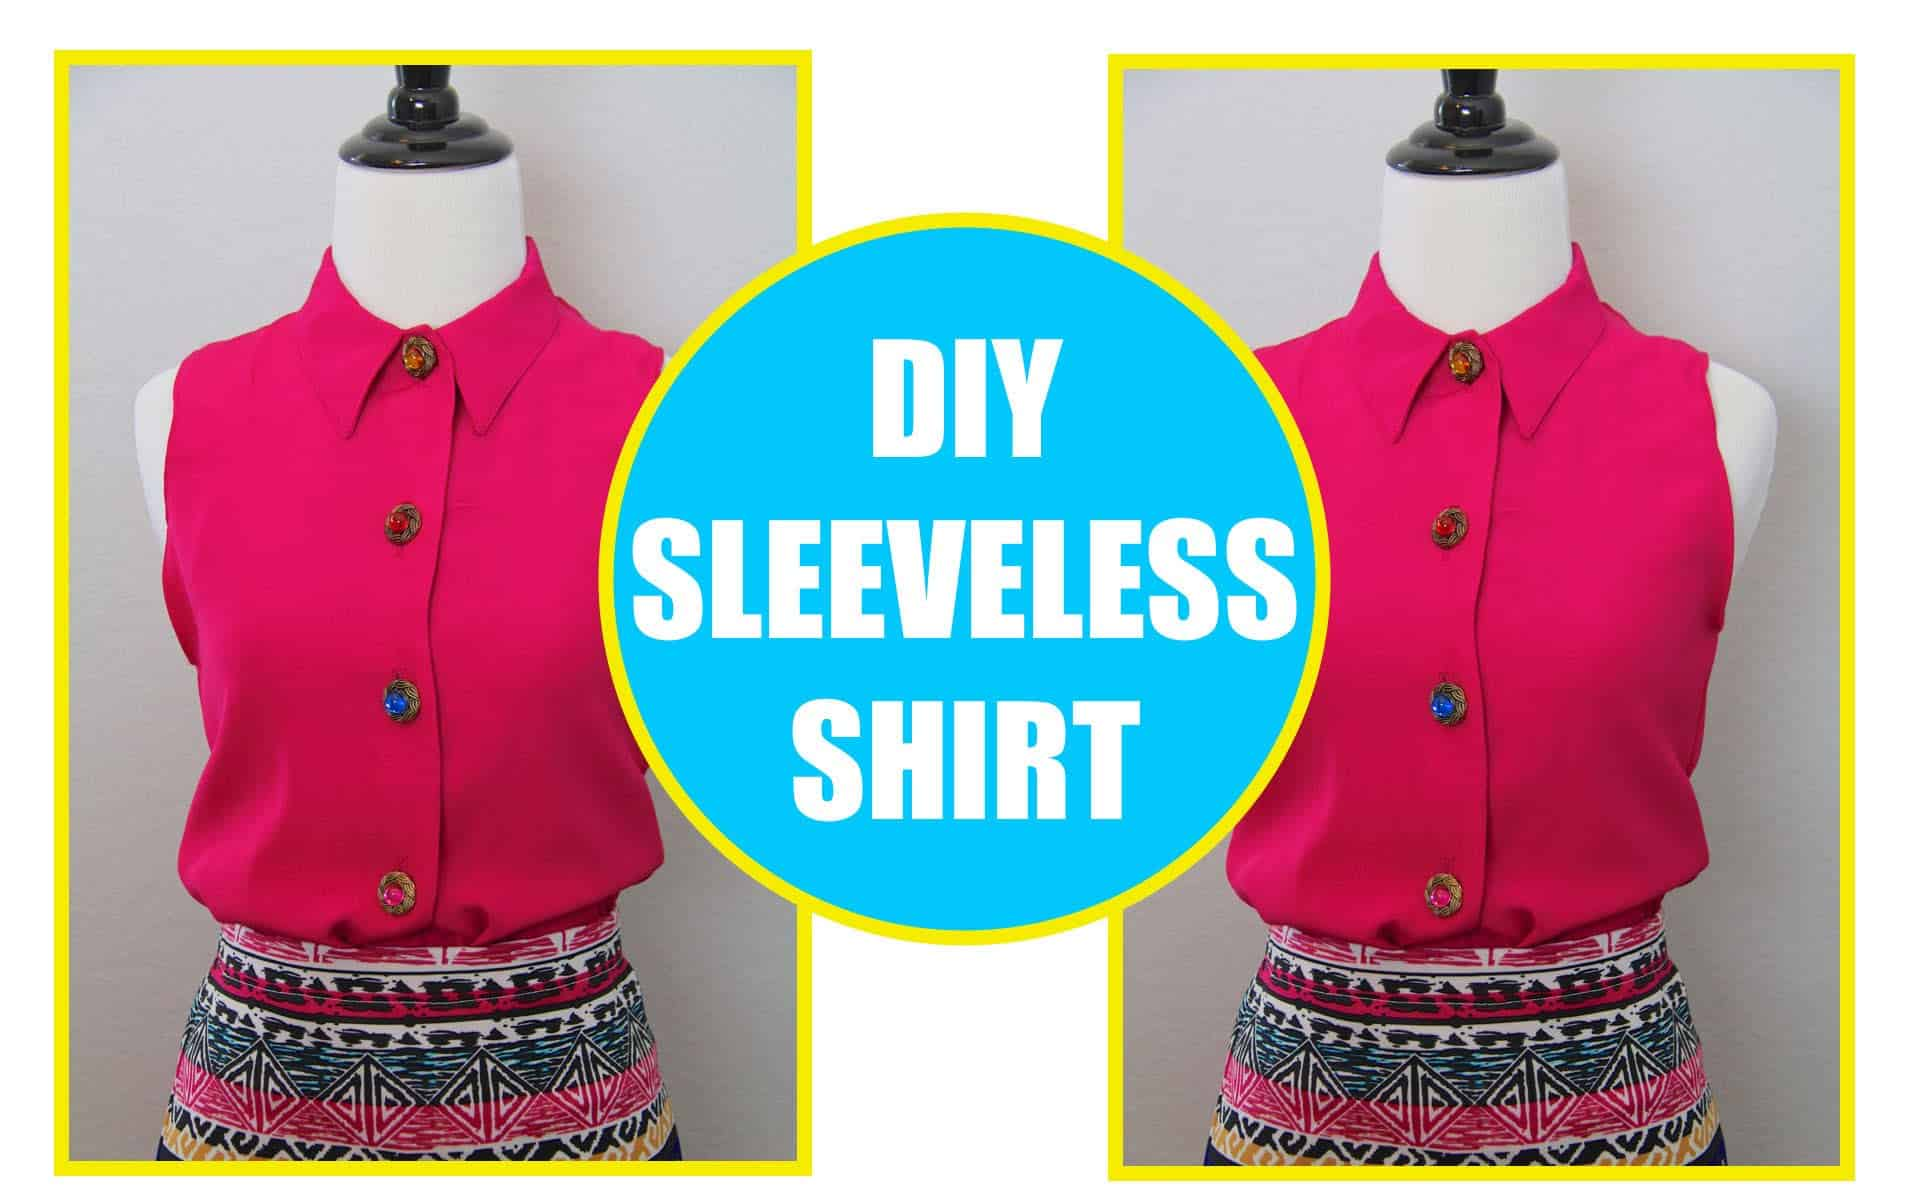 Long blouse to a sleeveless dress shirt